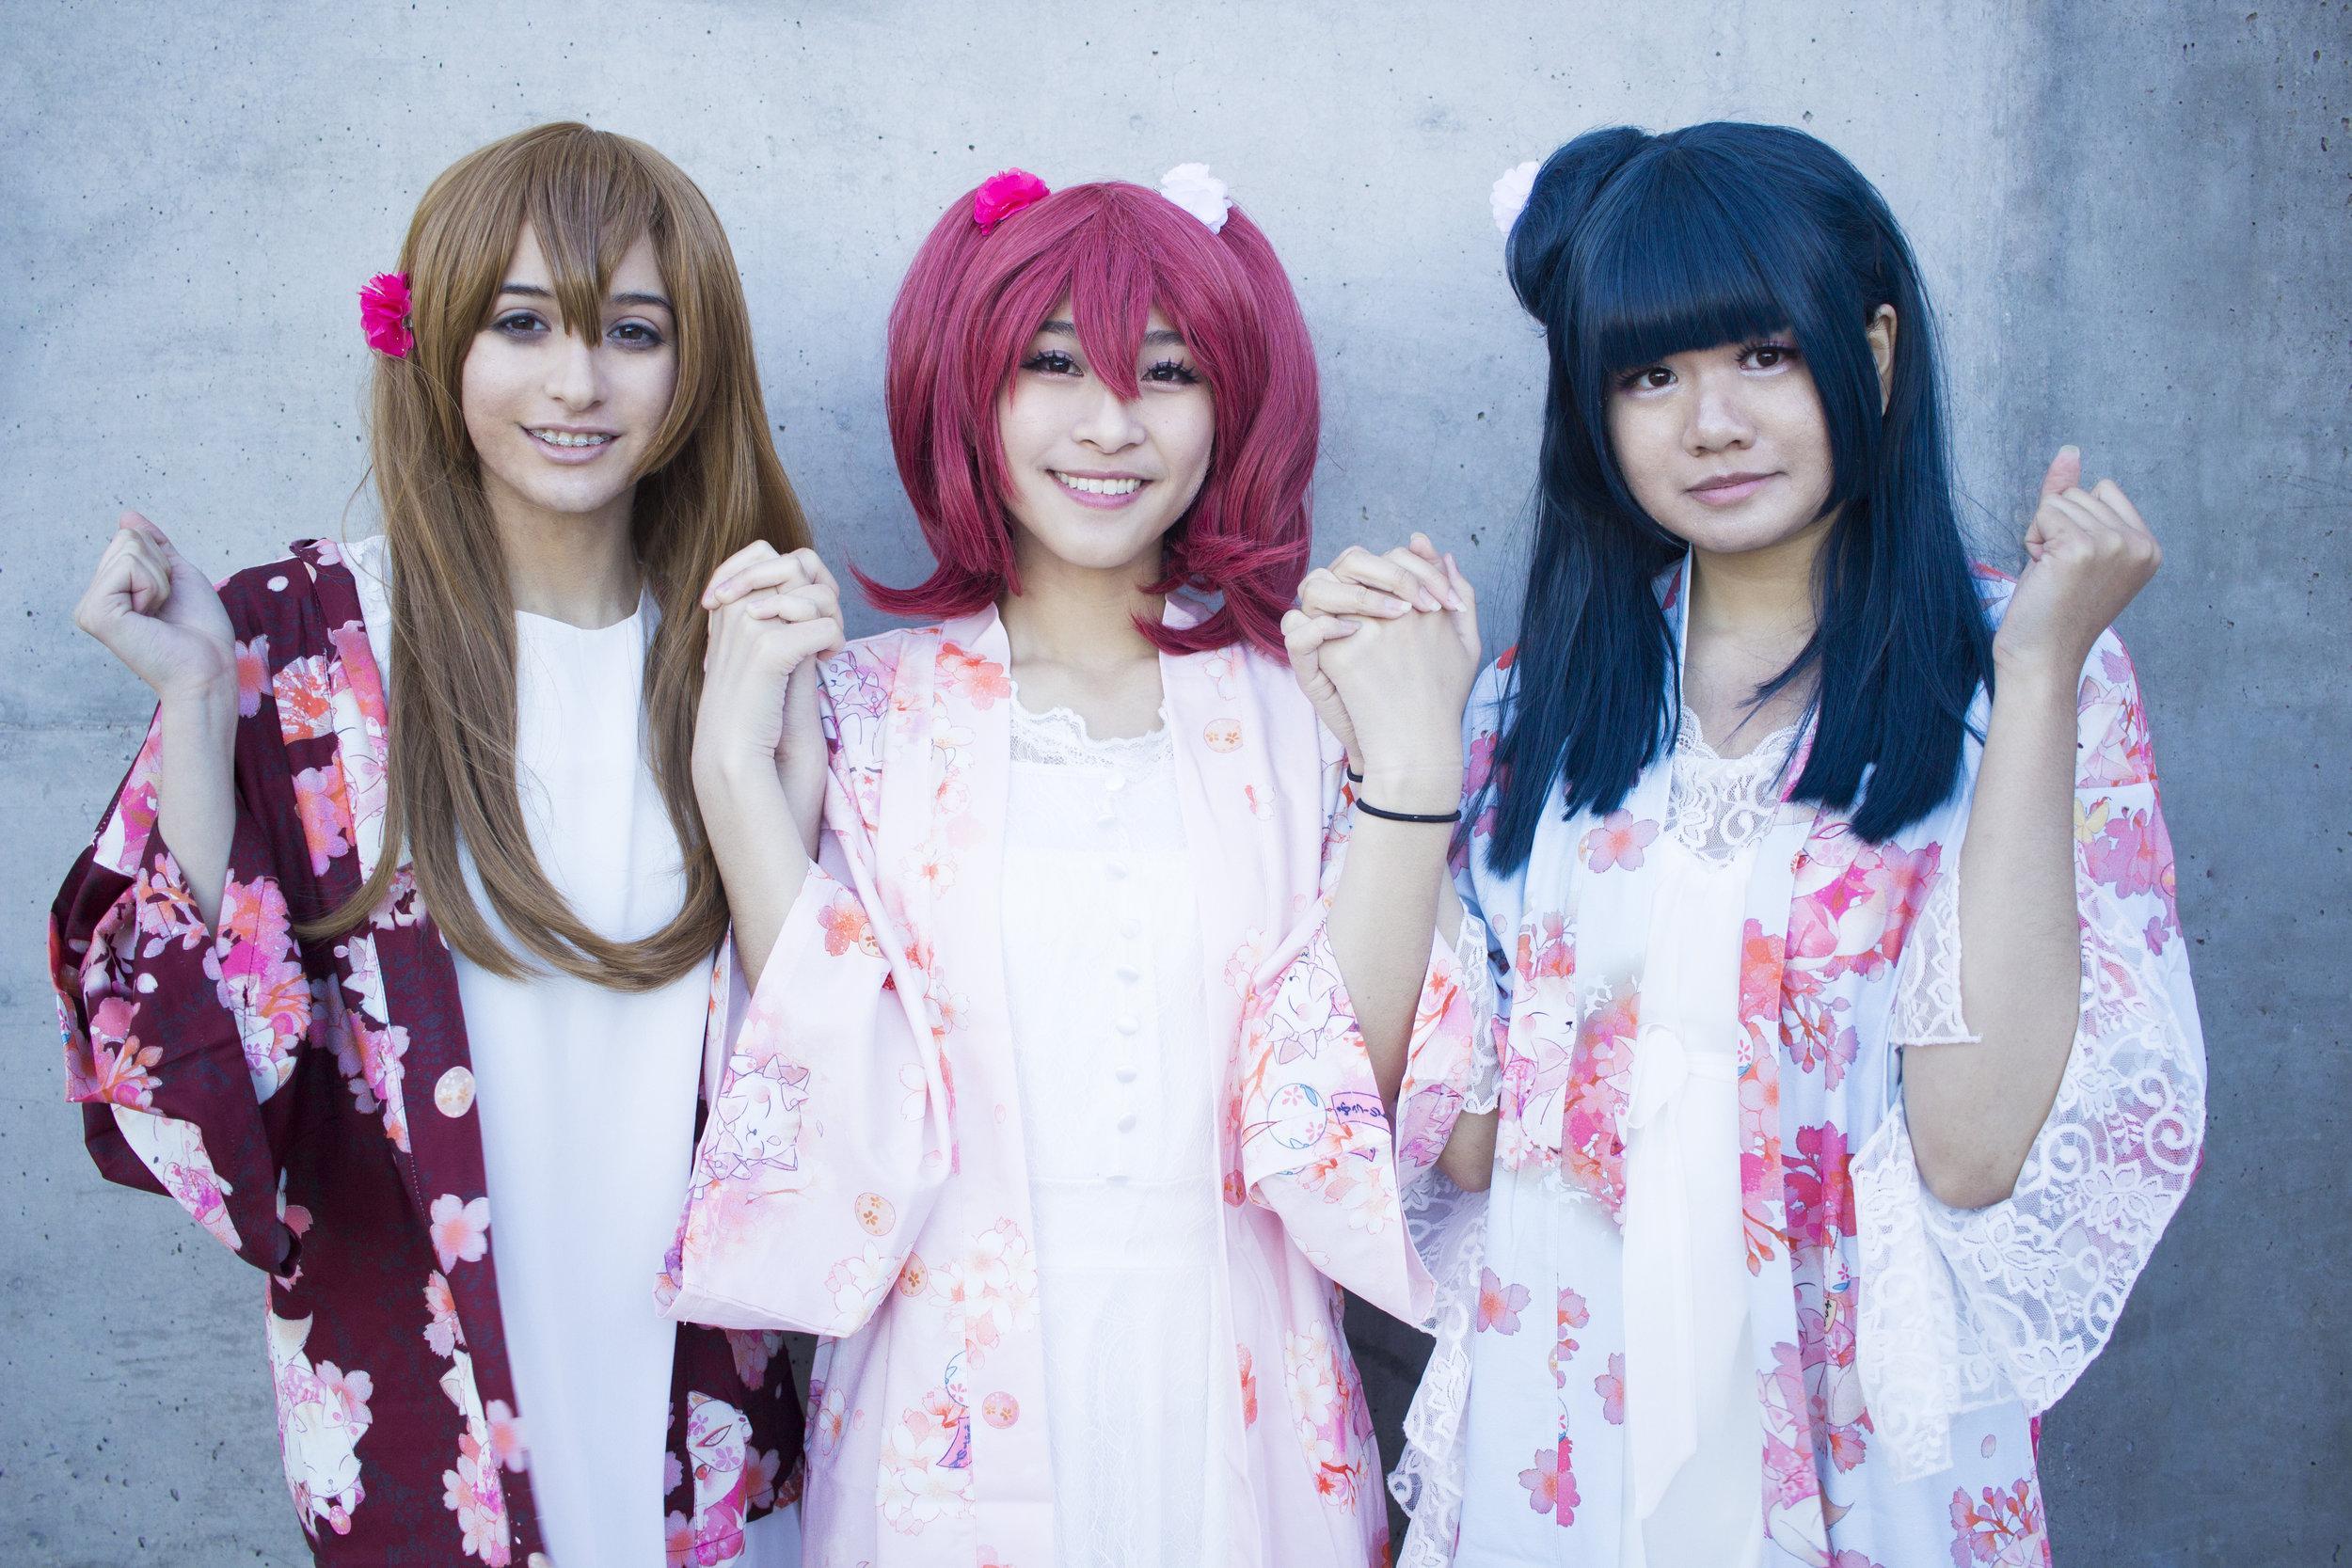 street-photography-matsuri-cosplay-mediasmith